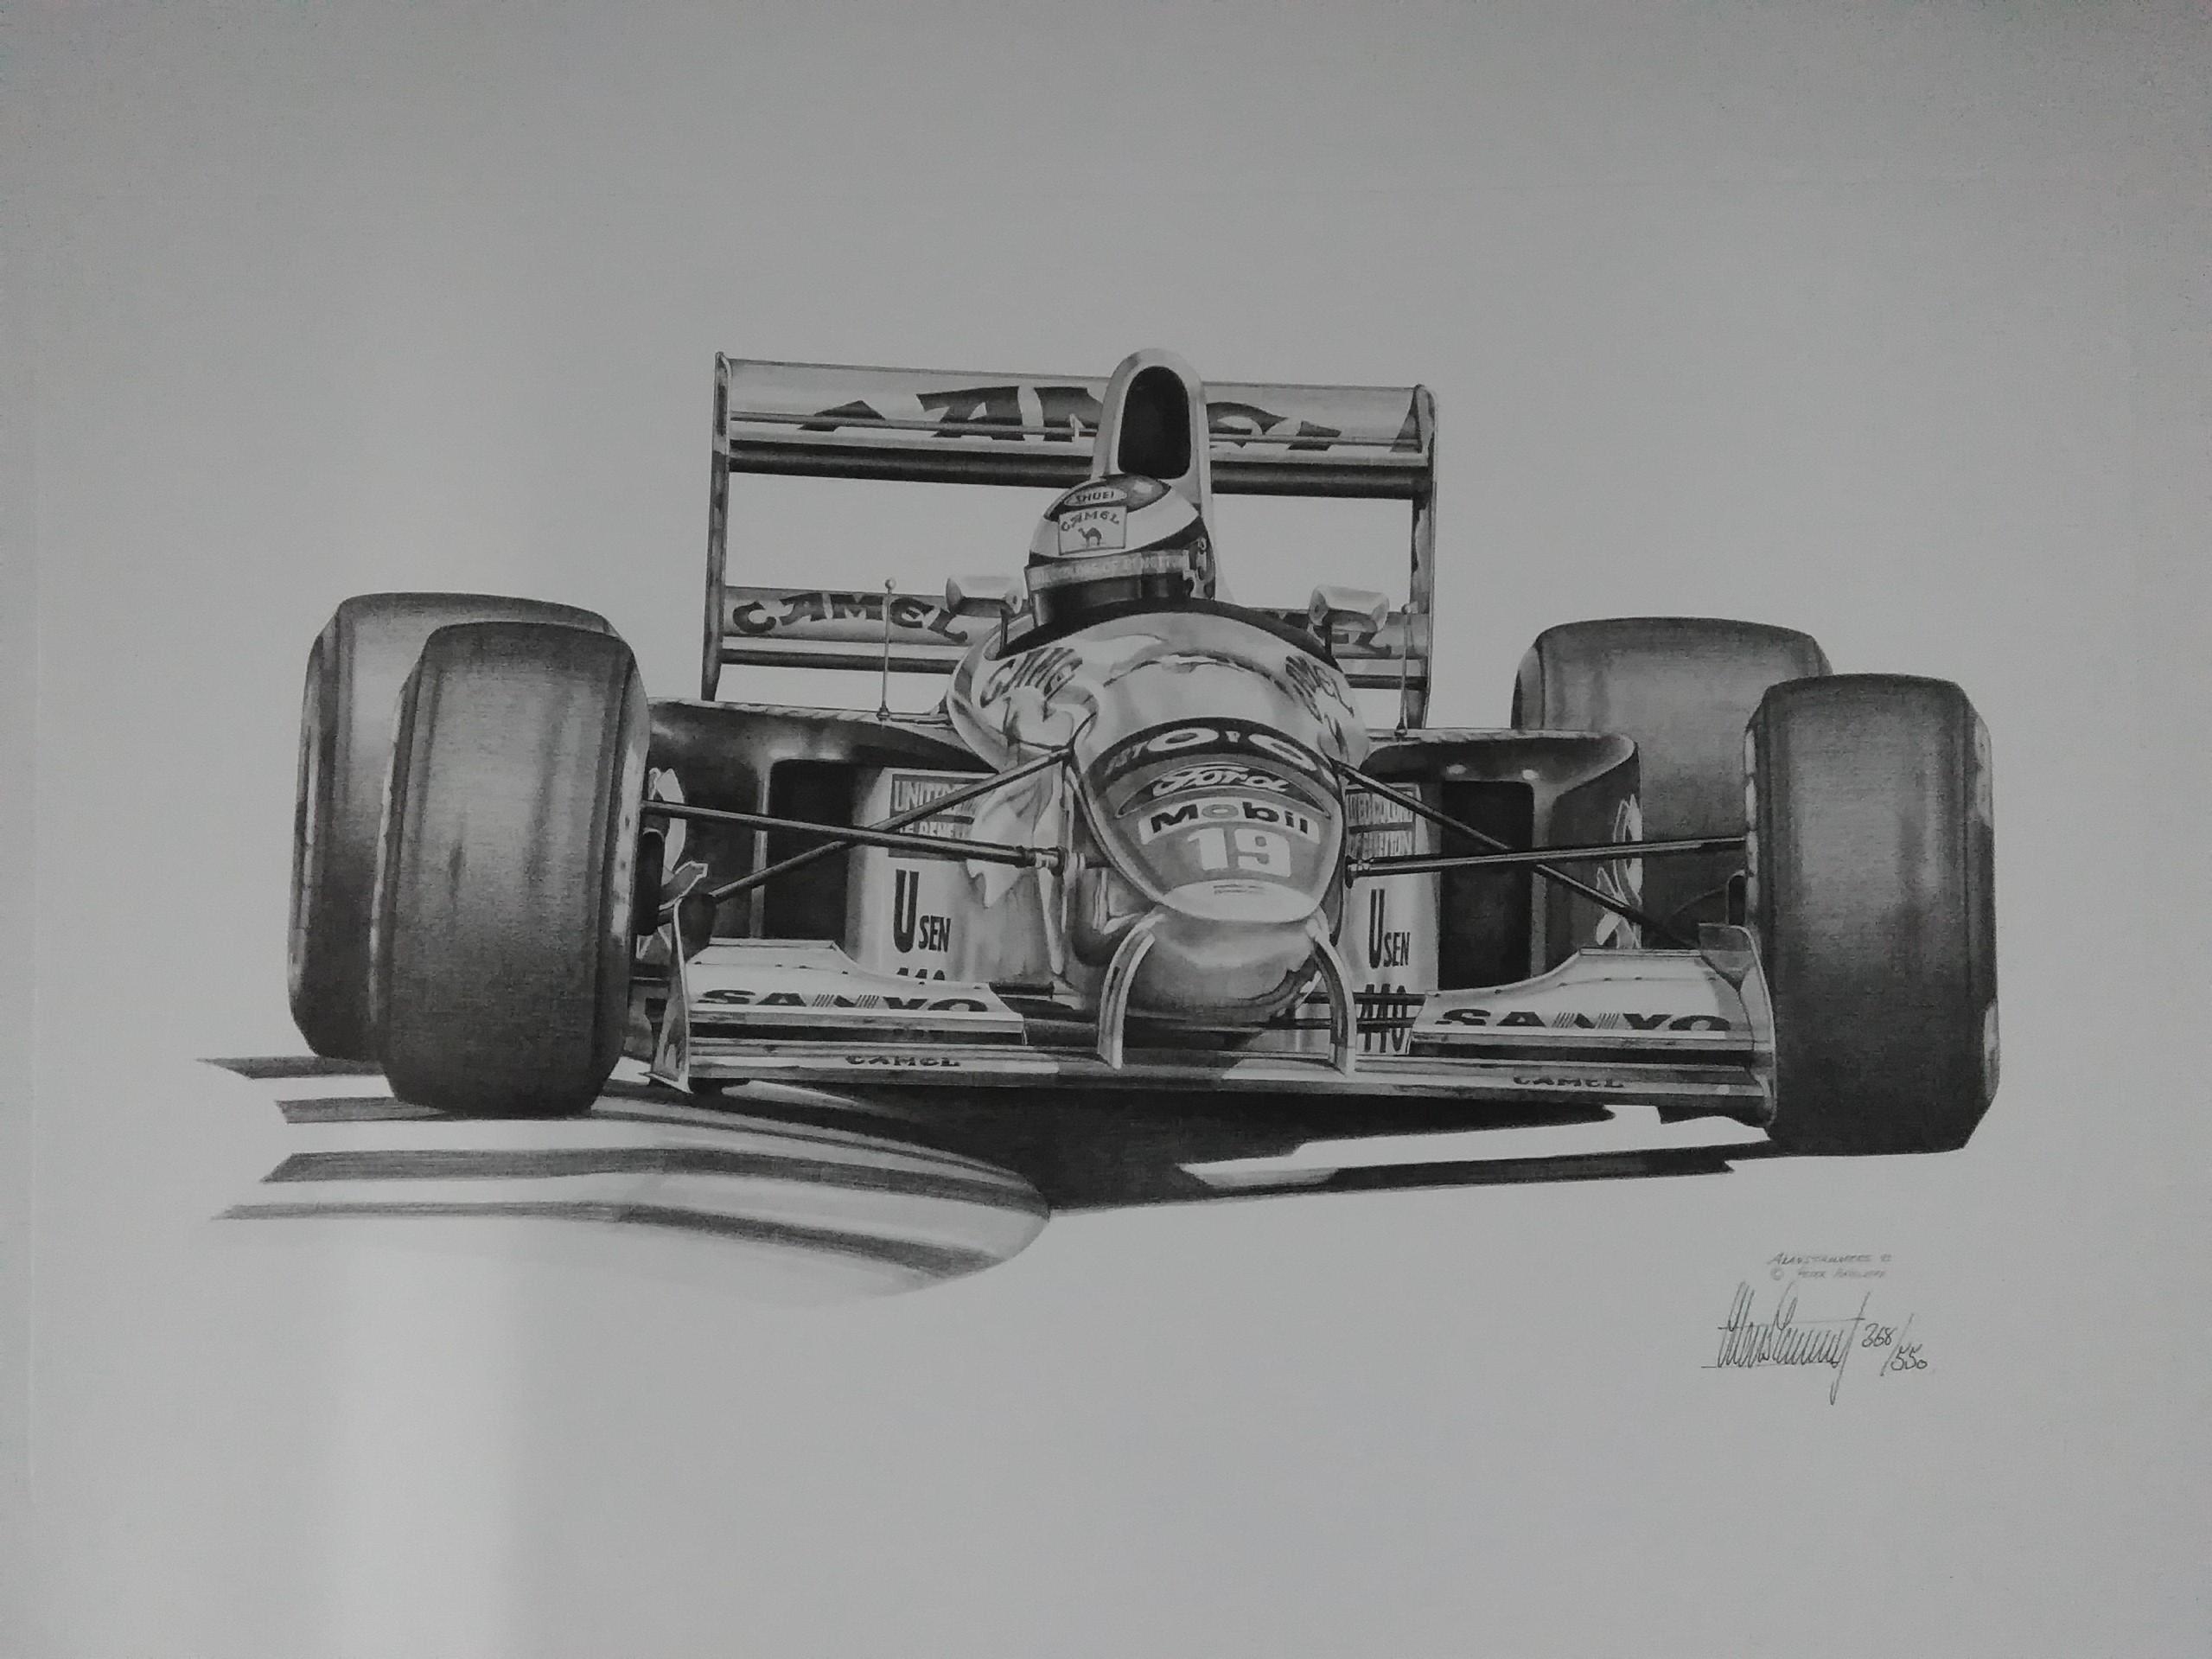 Michael Schumacher-1992 Canadian GP-A.Stammers